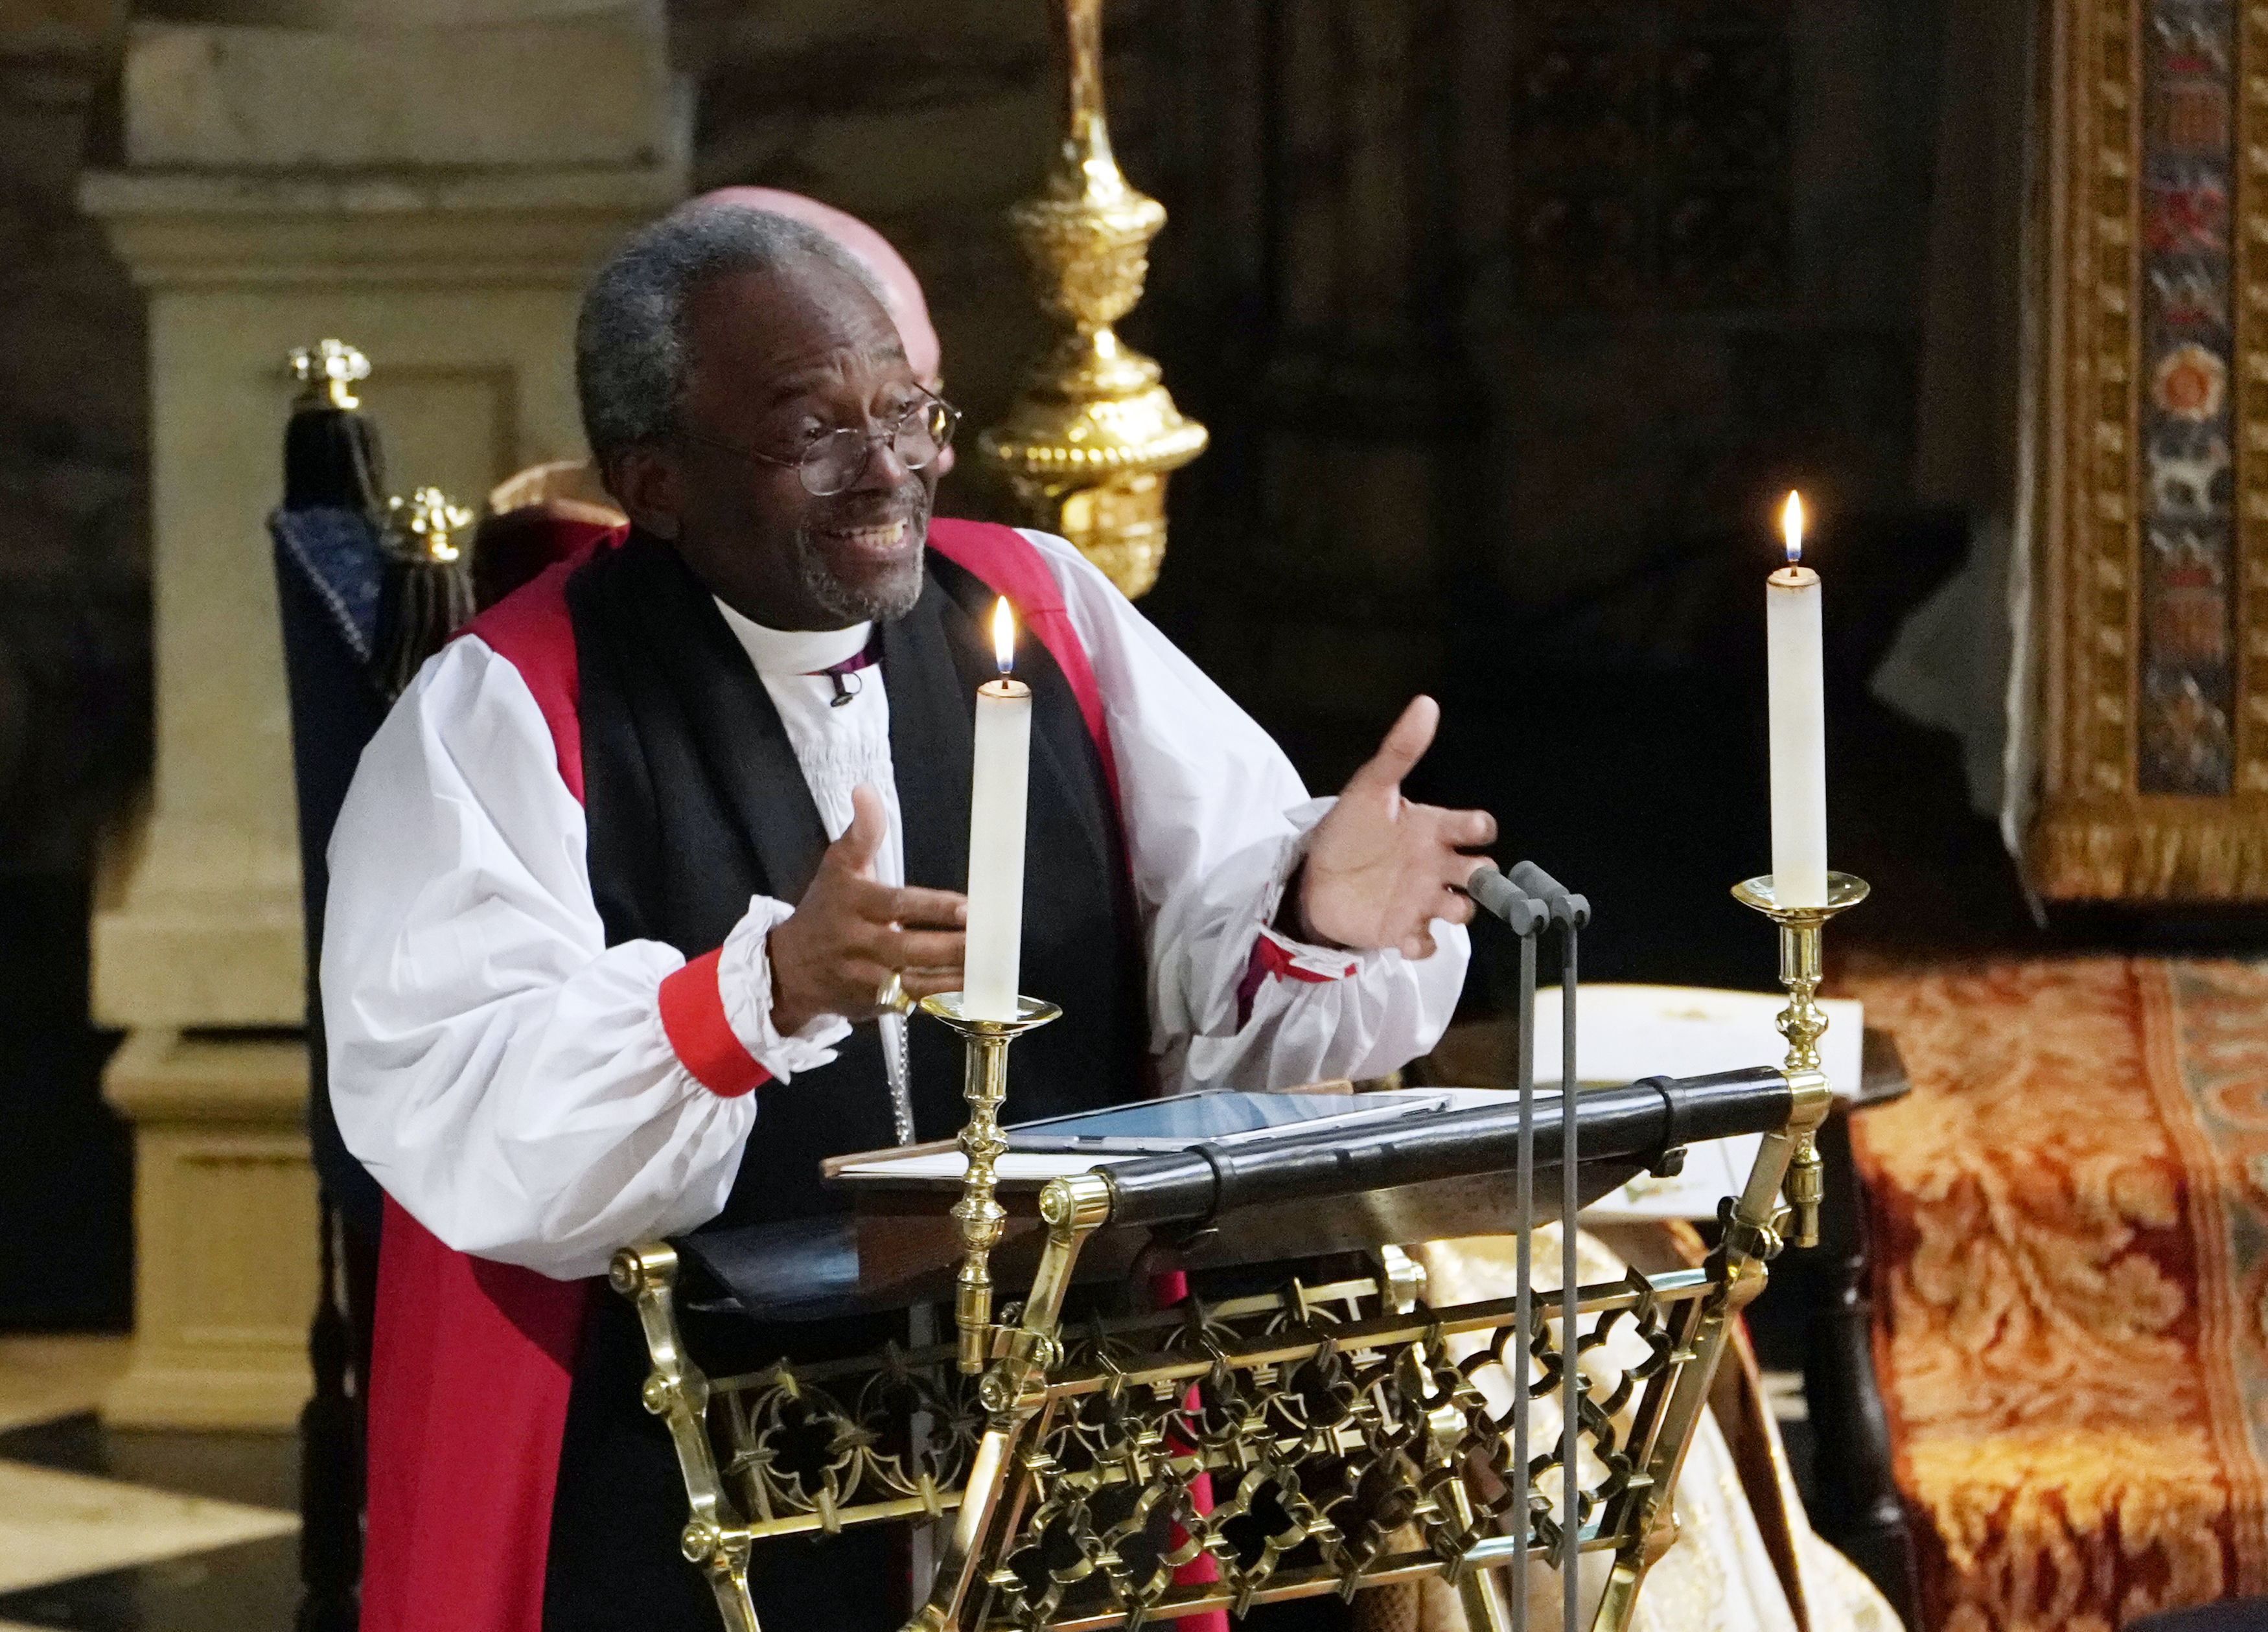 Bishop Michael Curry at Royal Wedding 2018